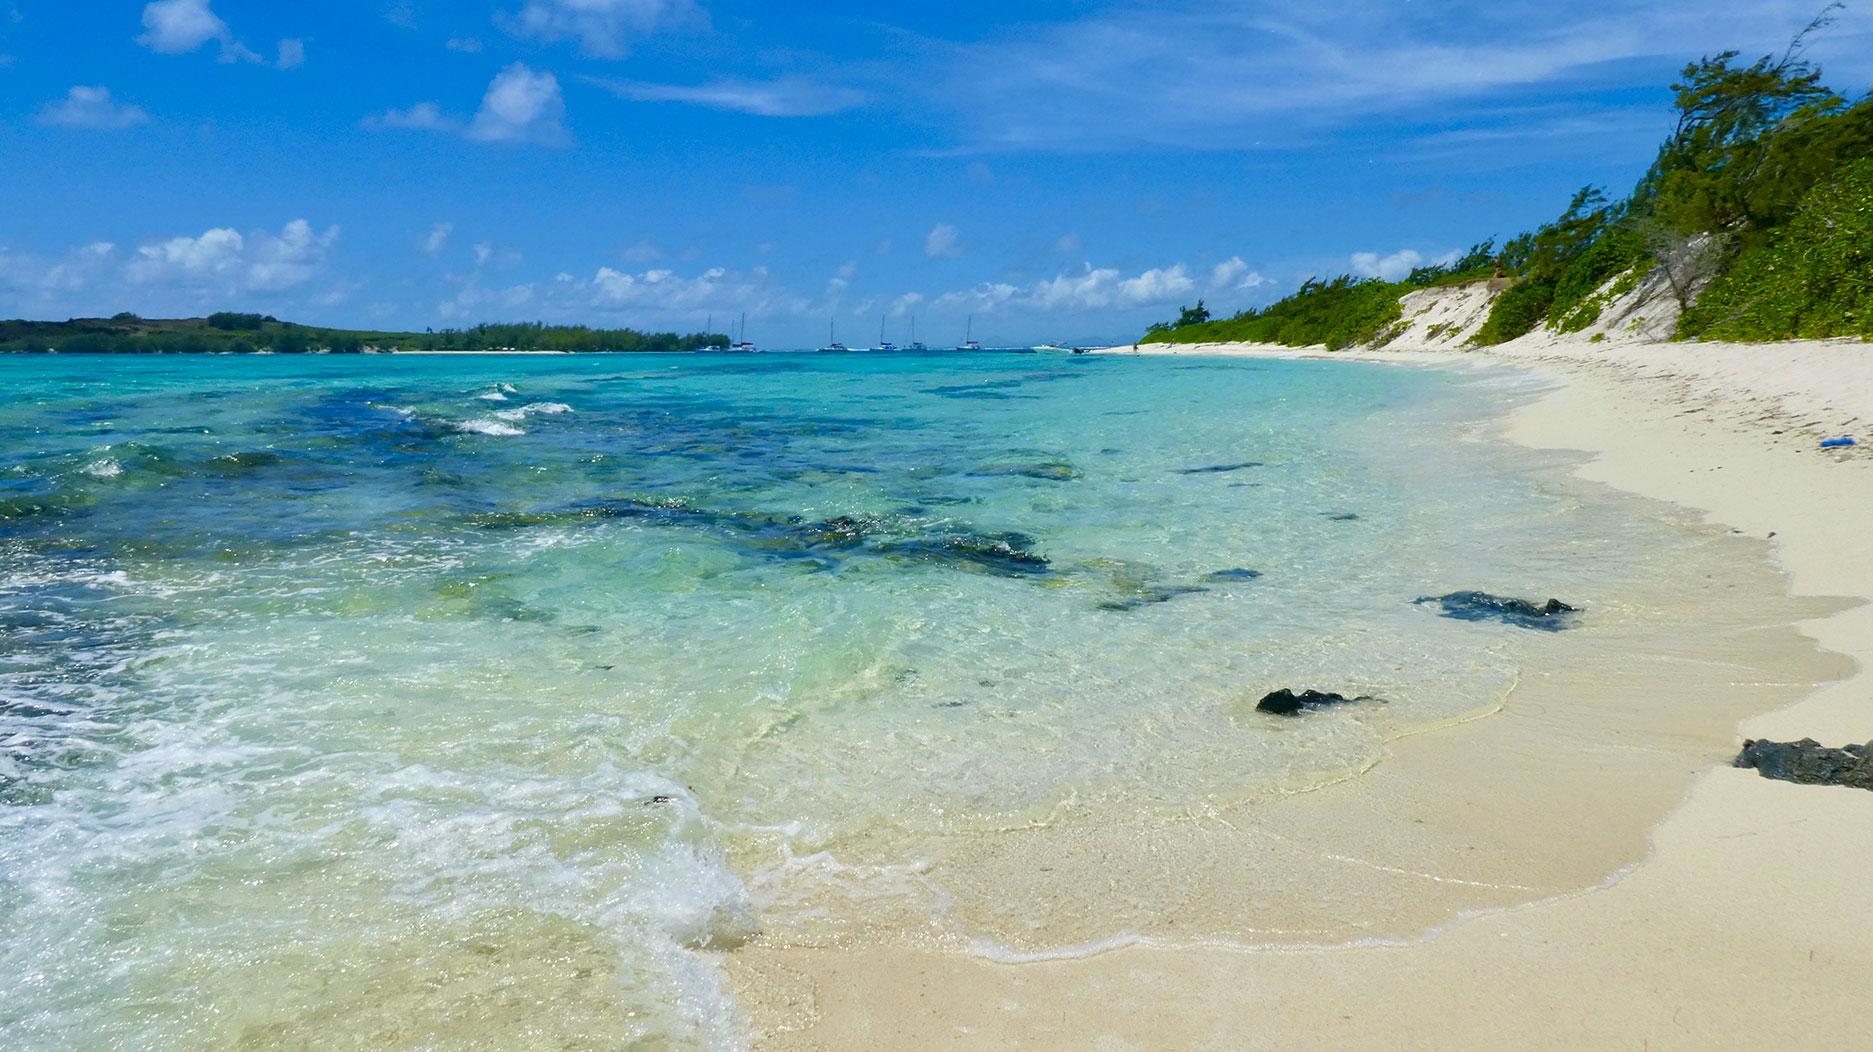 plage et eau turquoise ile maurice